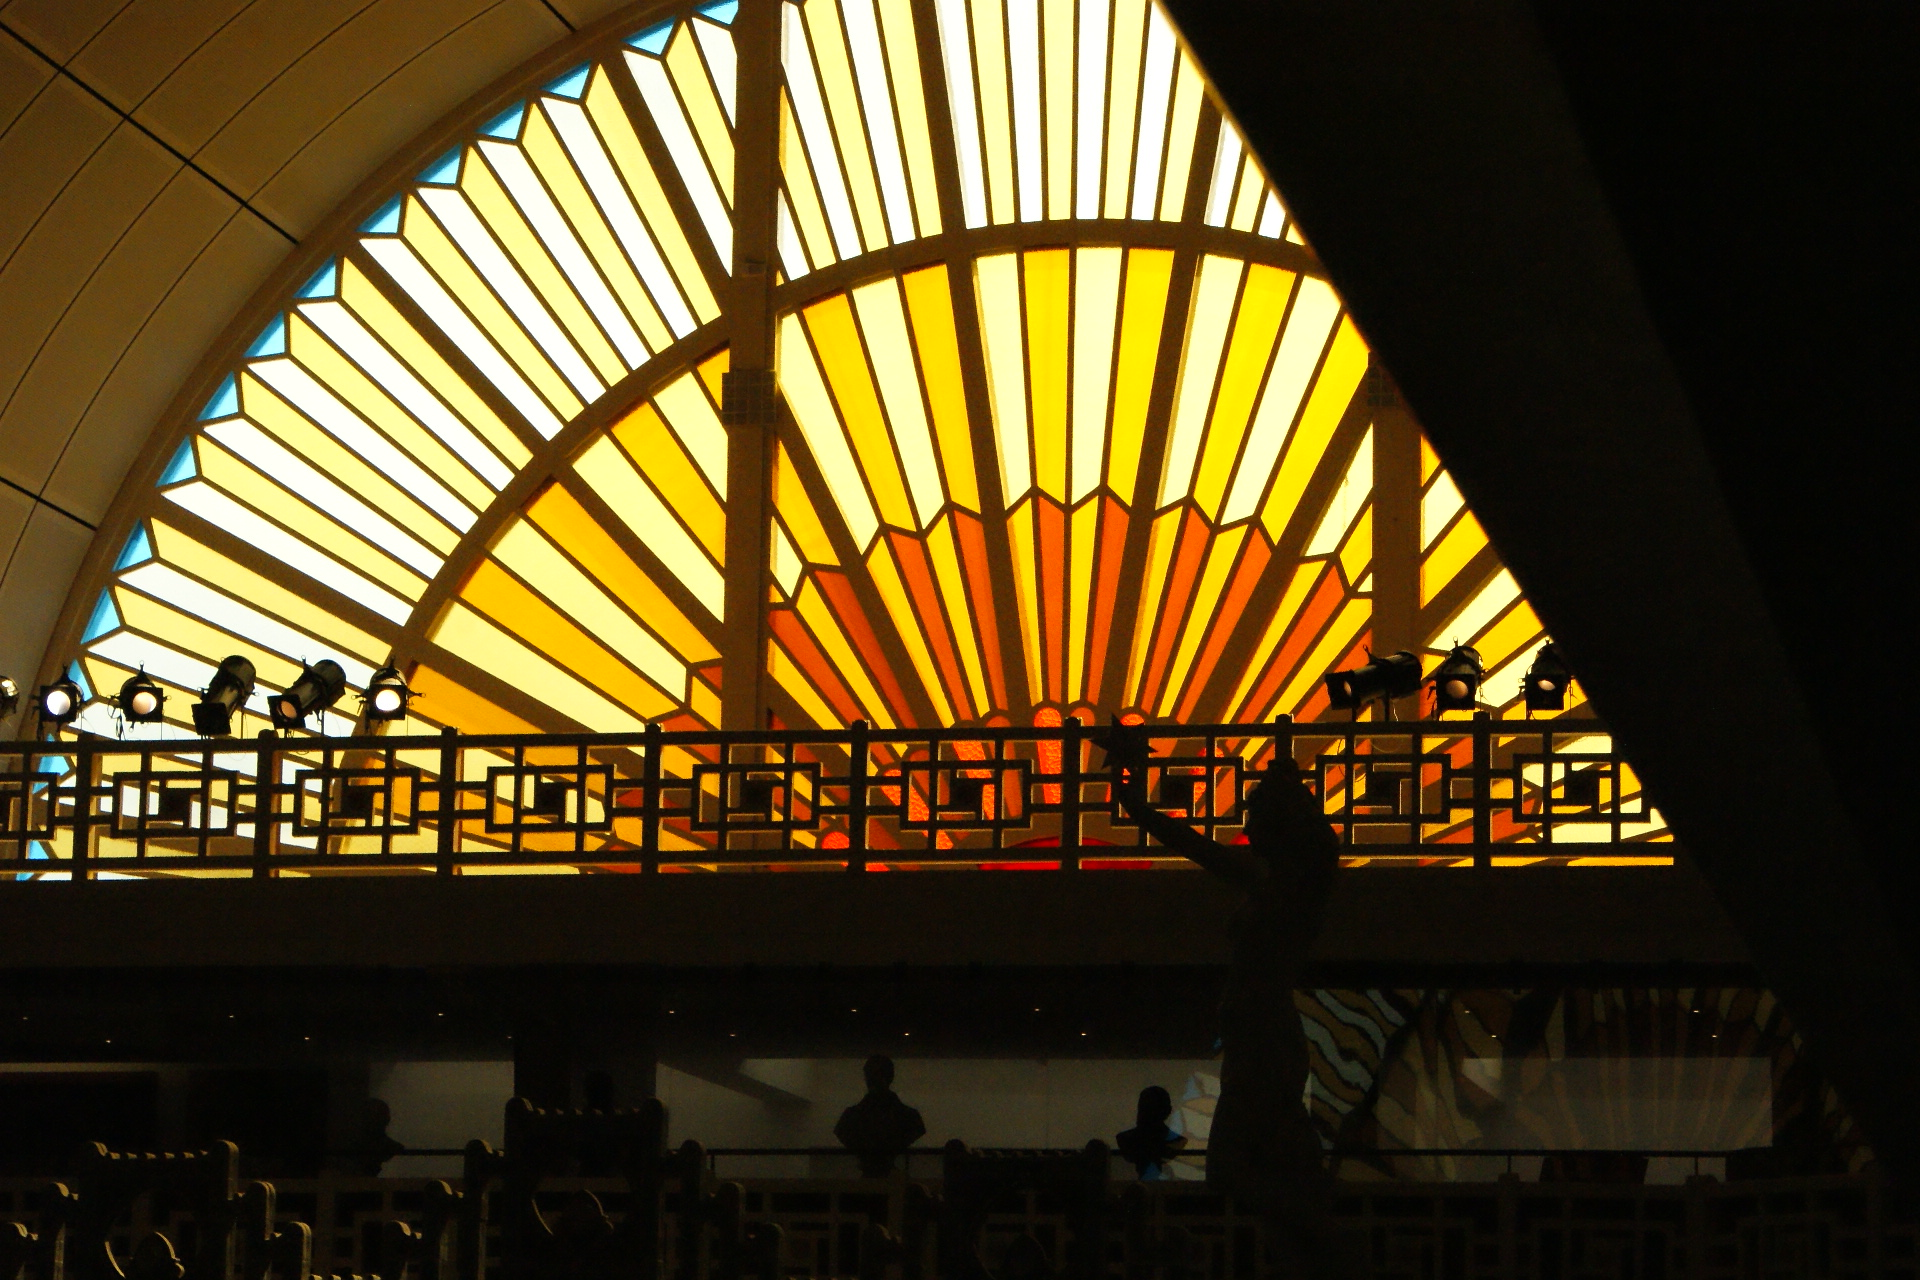 vitraux, Piscine de Roubaix